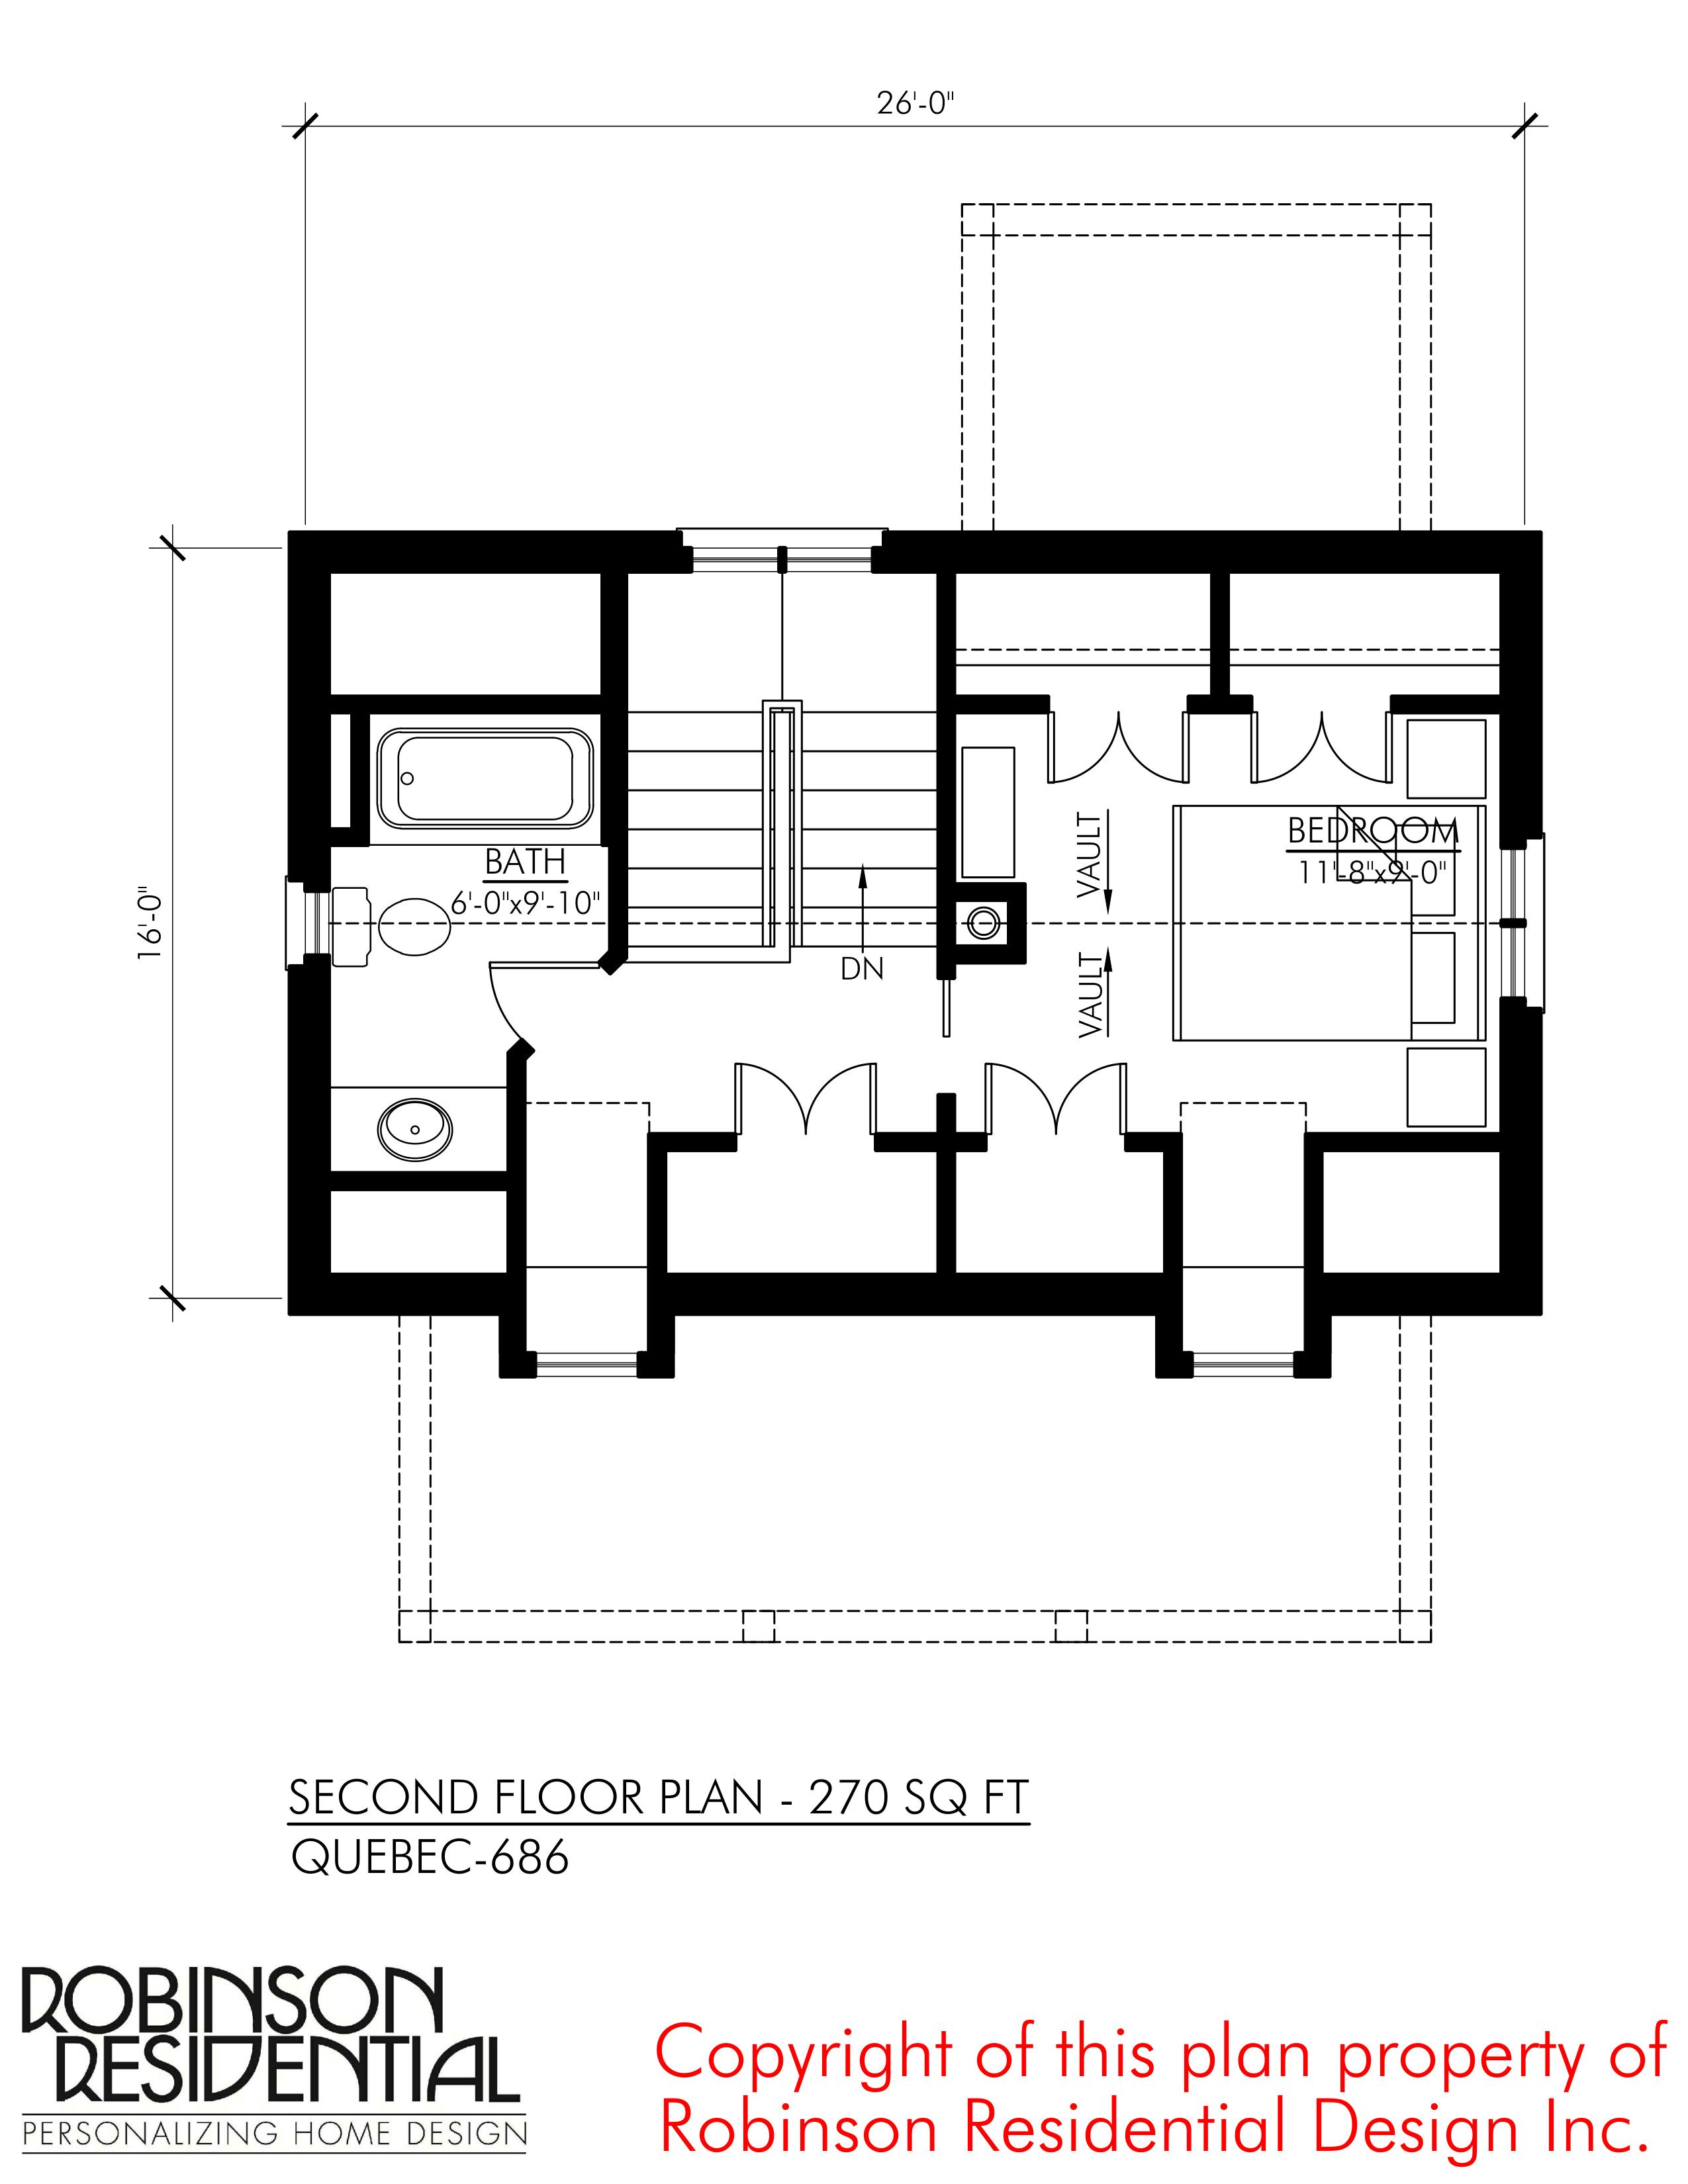 Quebec-686 - Robinson Plans